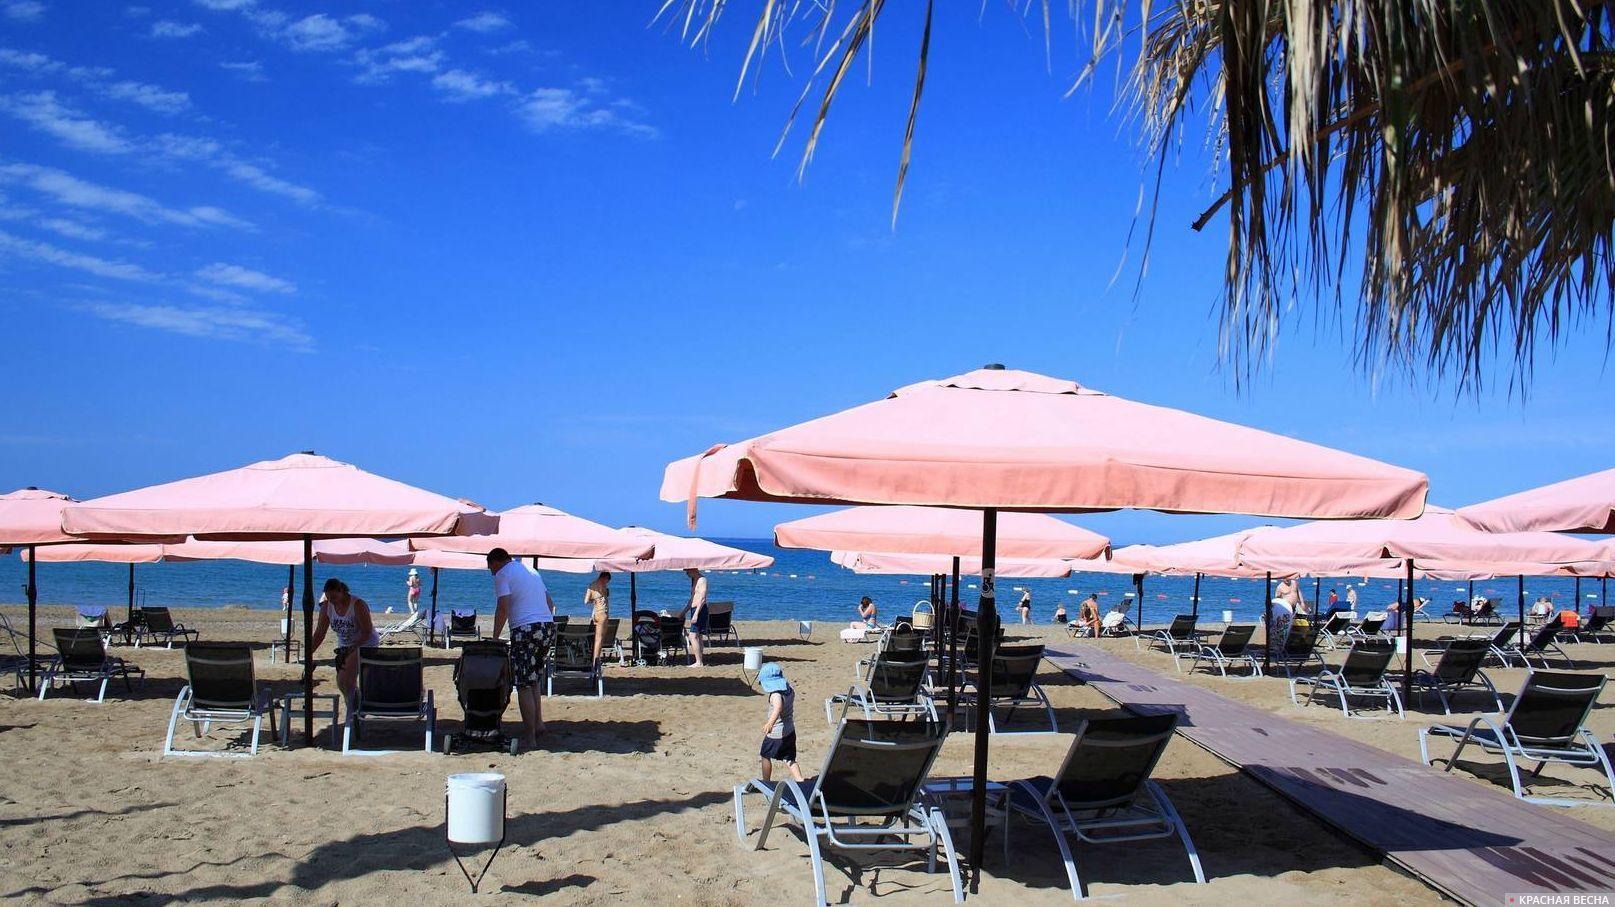 Шезлонги на пляже. Турция